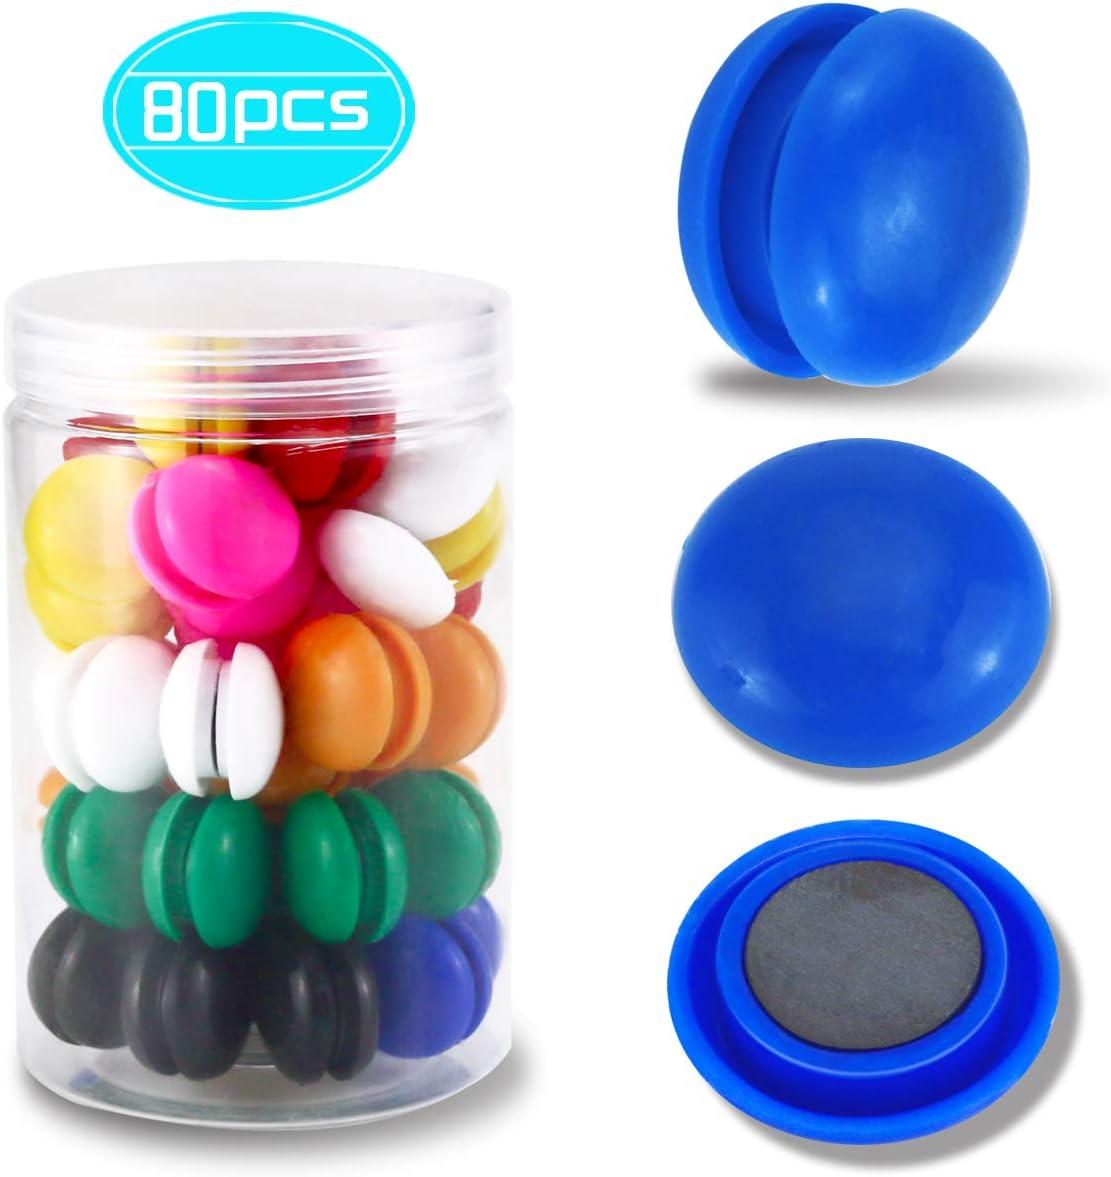 DLOnline 80 Pieces 2cm 0.8'' Half Ball Mini Fridge Magnets, Round Button Magnetic Office Supplies Magnets(8 colors)